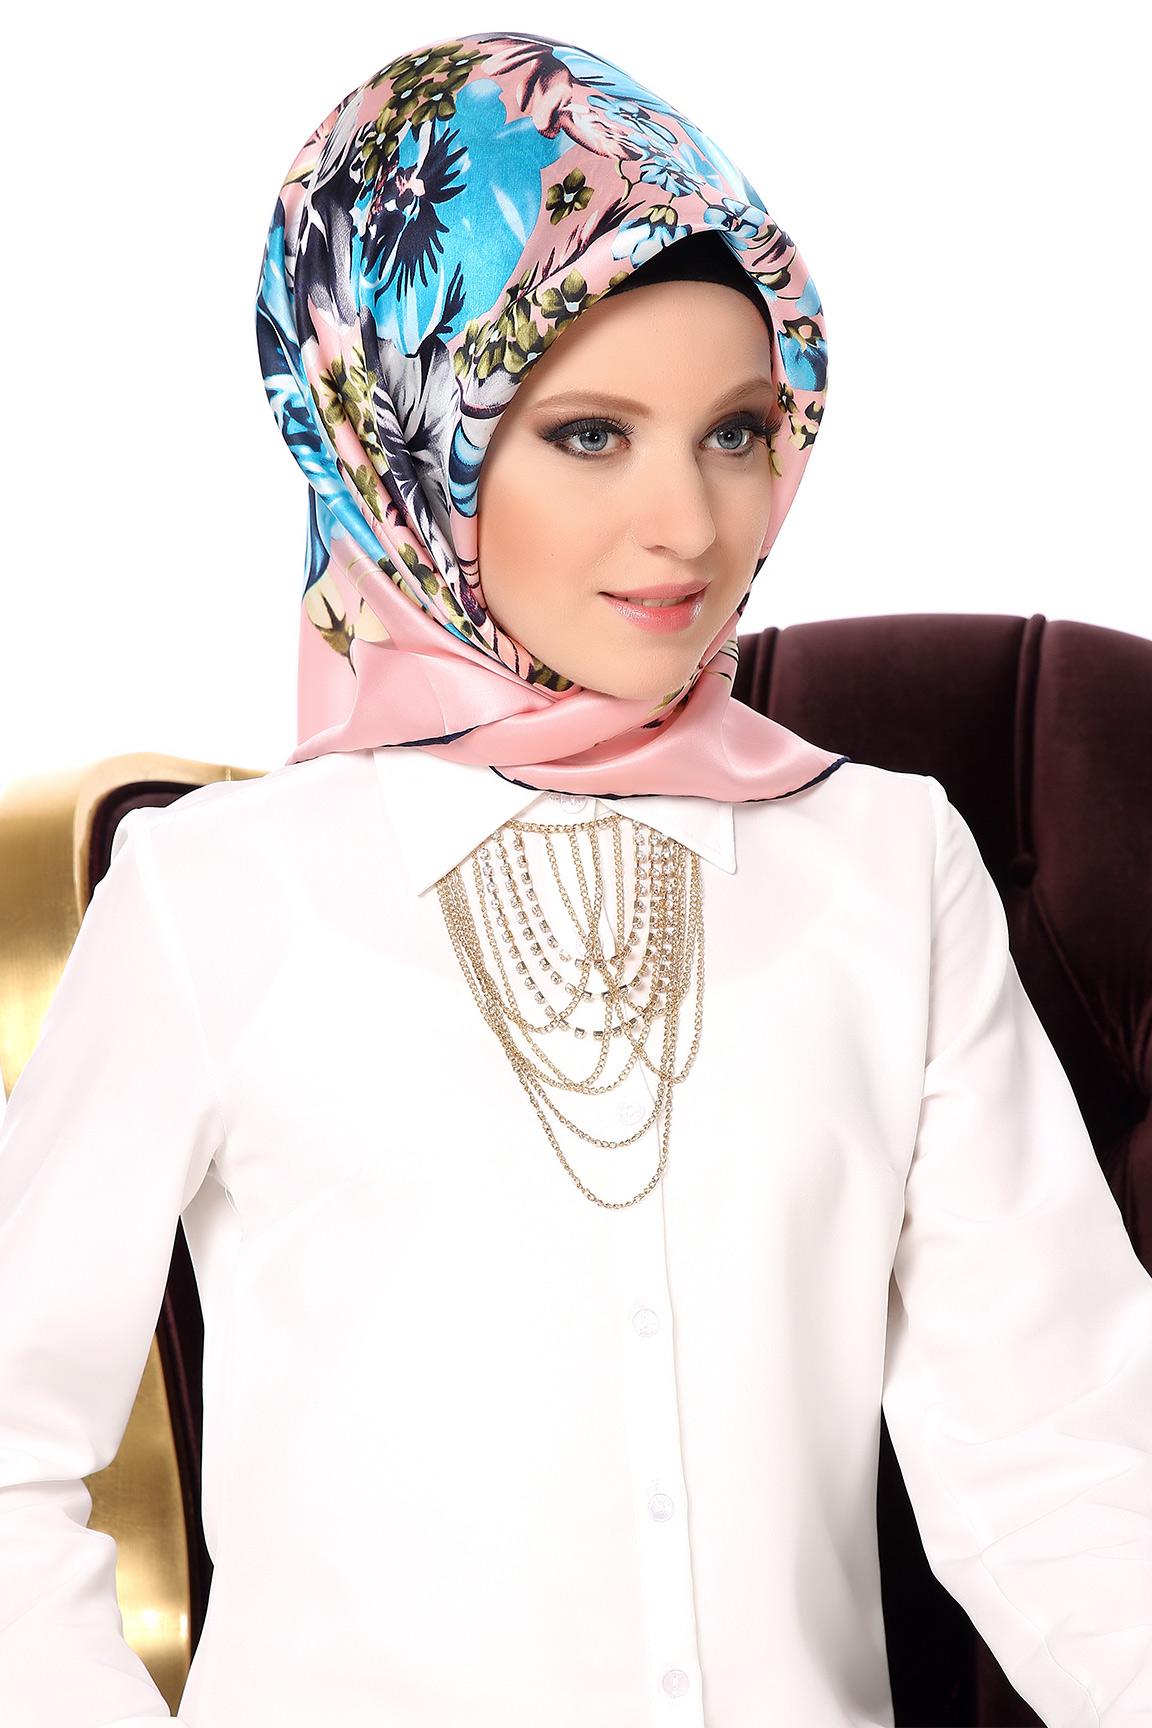 بالصور موديلات حجابات تركية , اجمل صور للحجاب التركي 2628 6